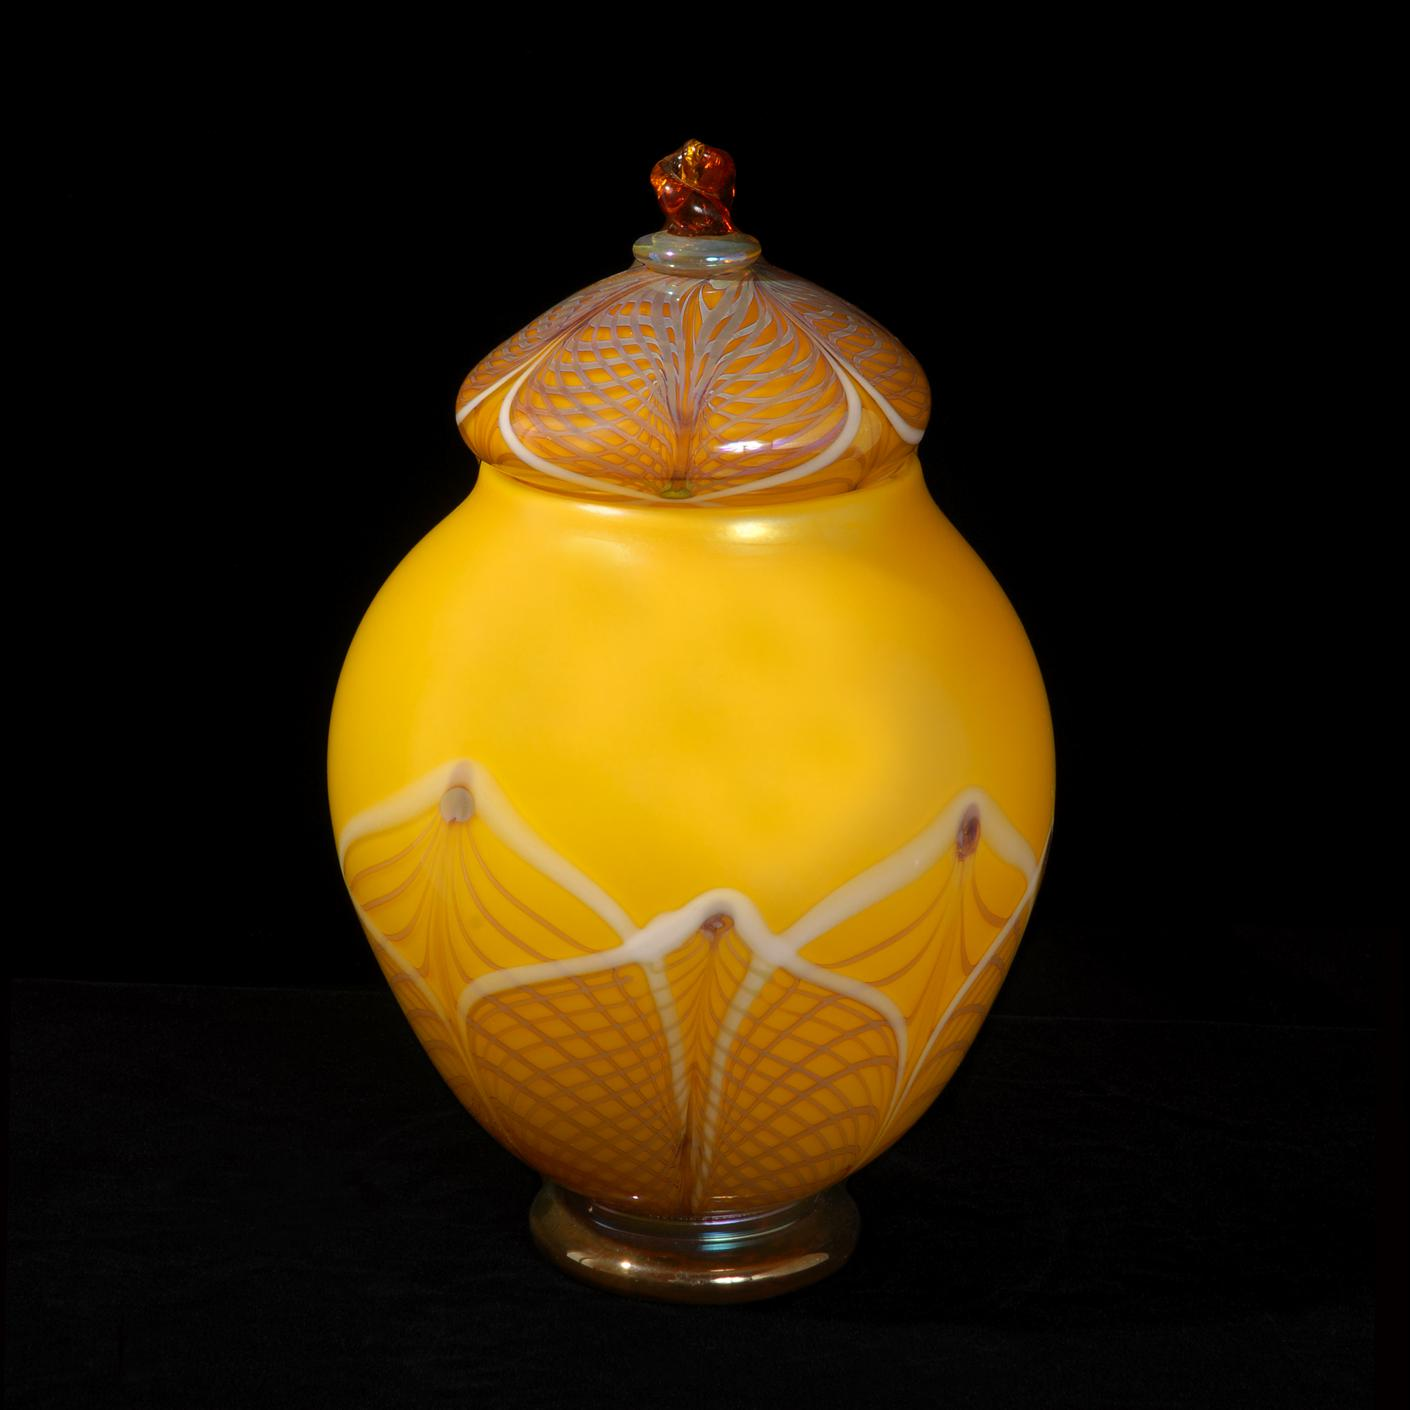 Lemon Lace lidded Jar